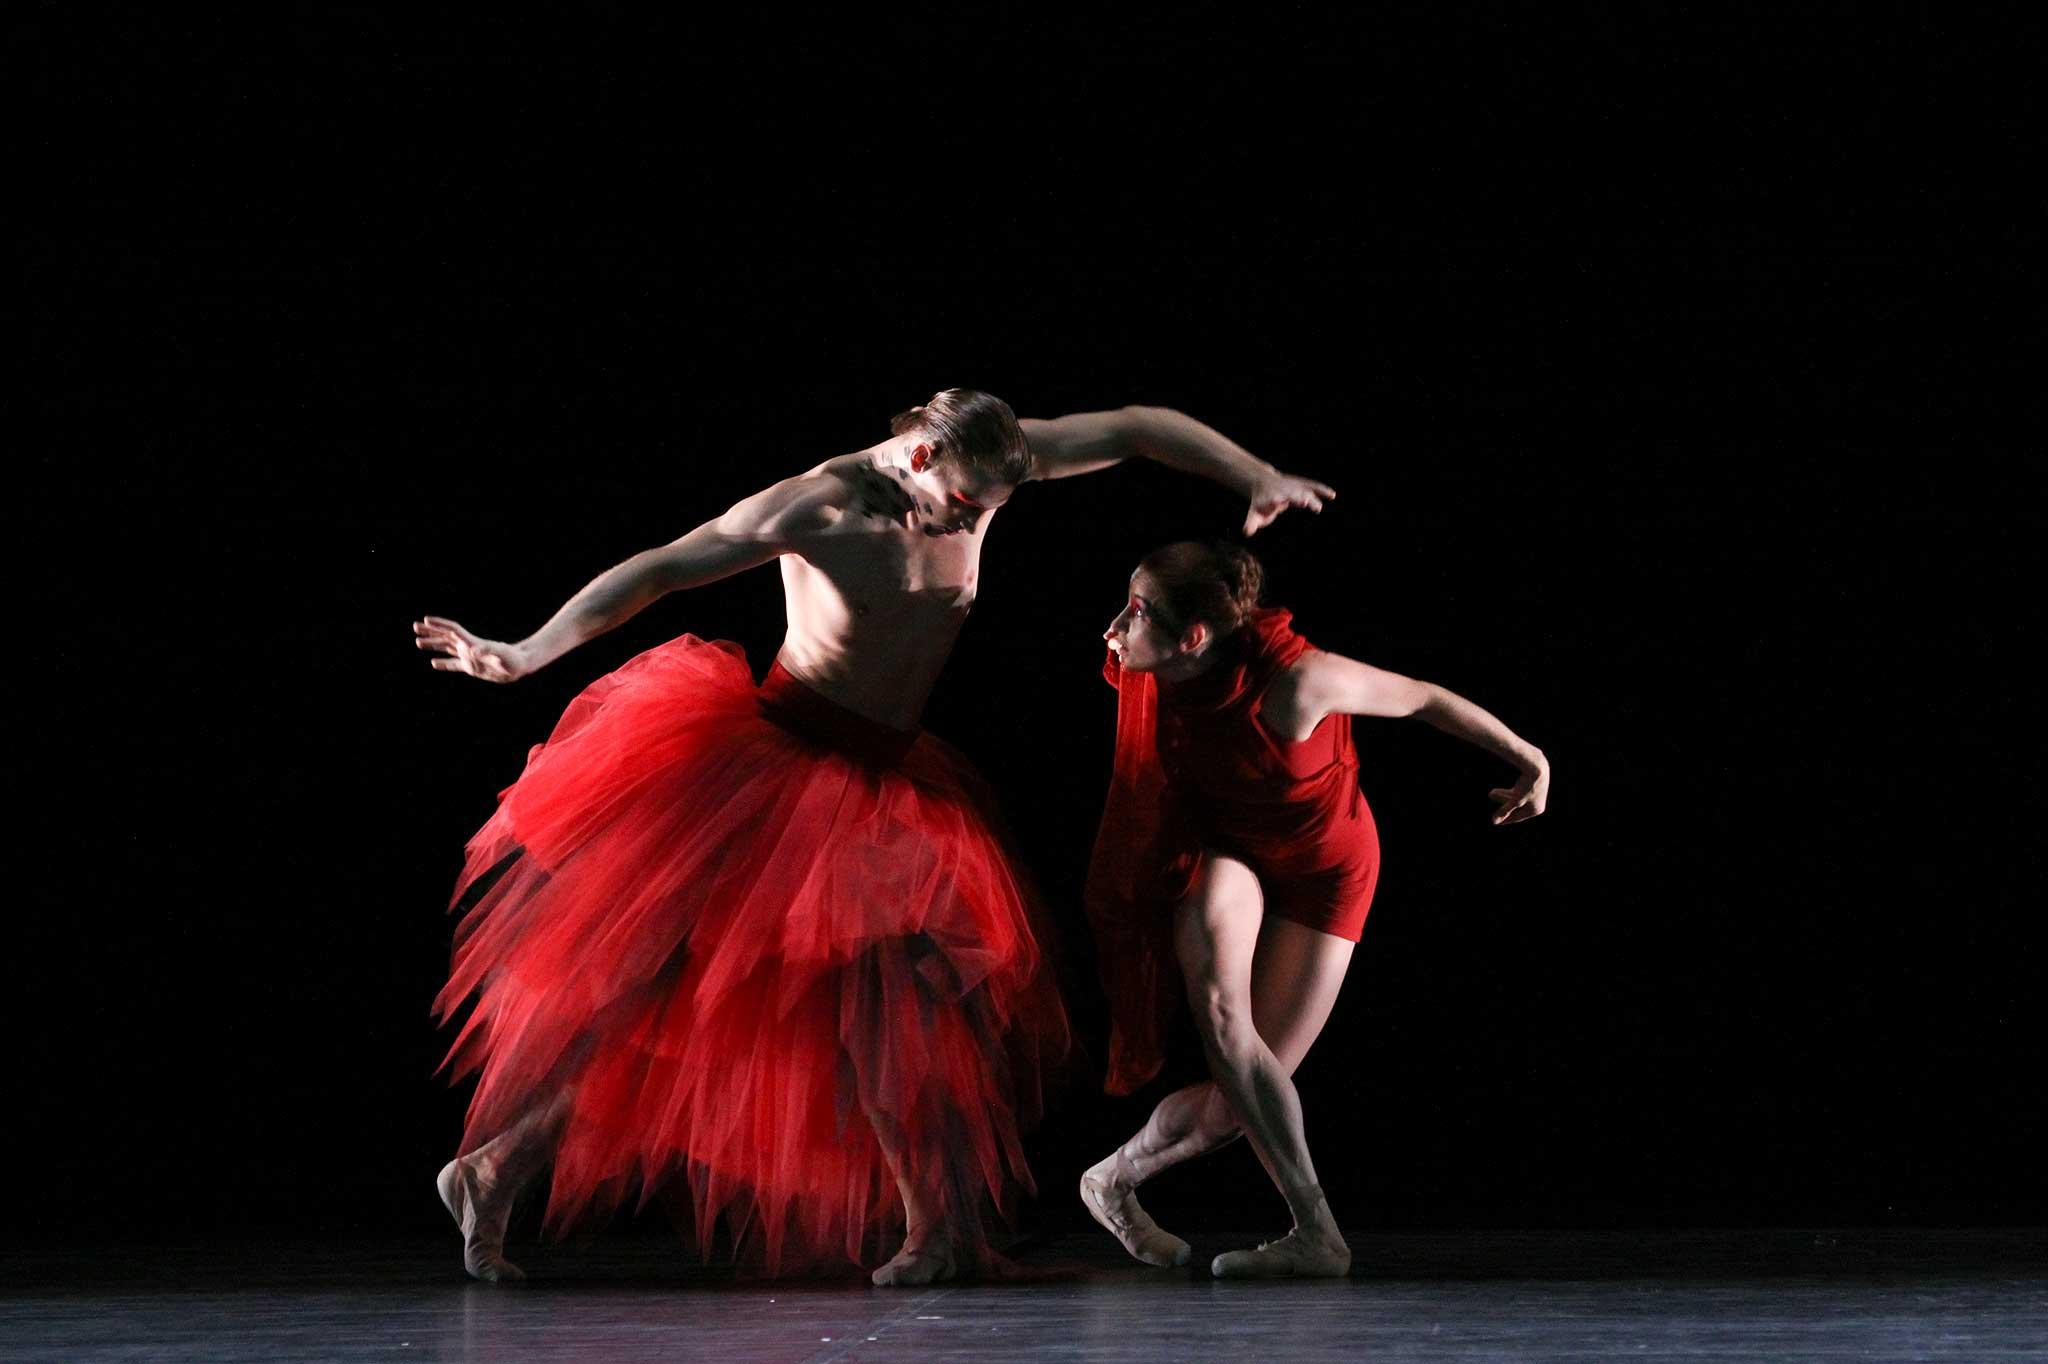 Edvin Revazov und Patricia Tichy tanzen im Kranichkostüm.